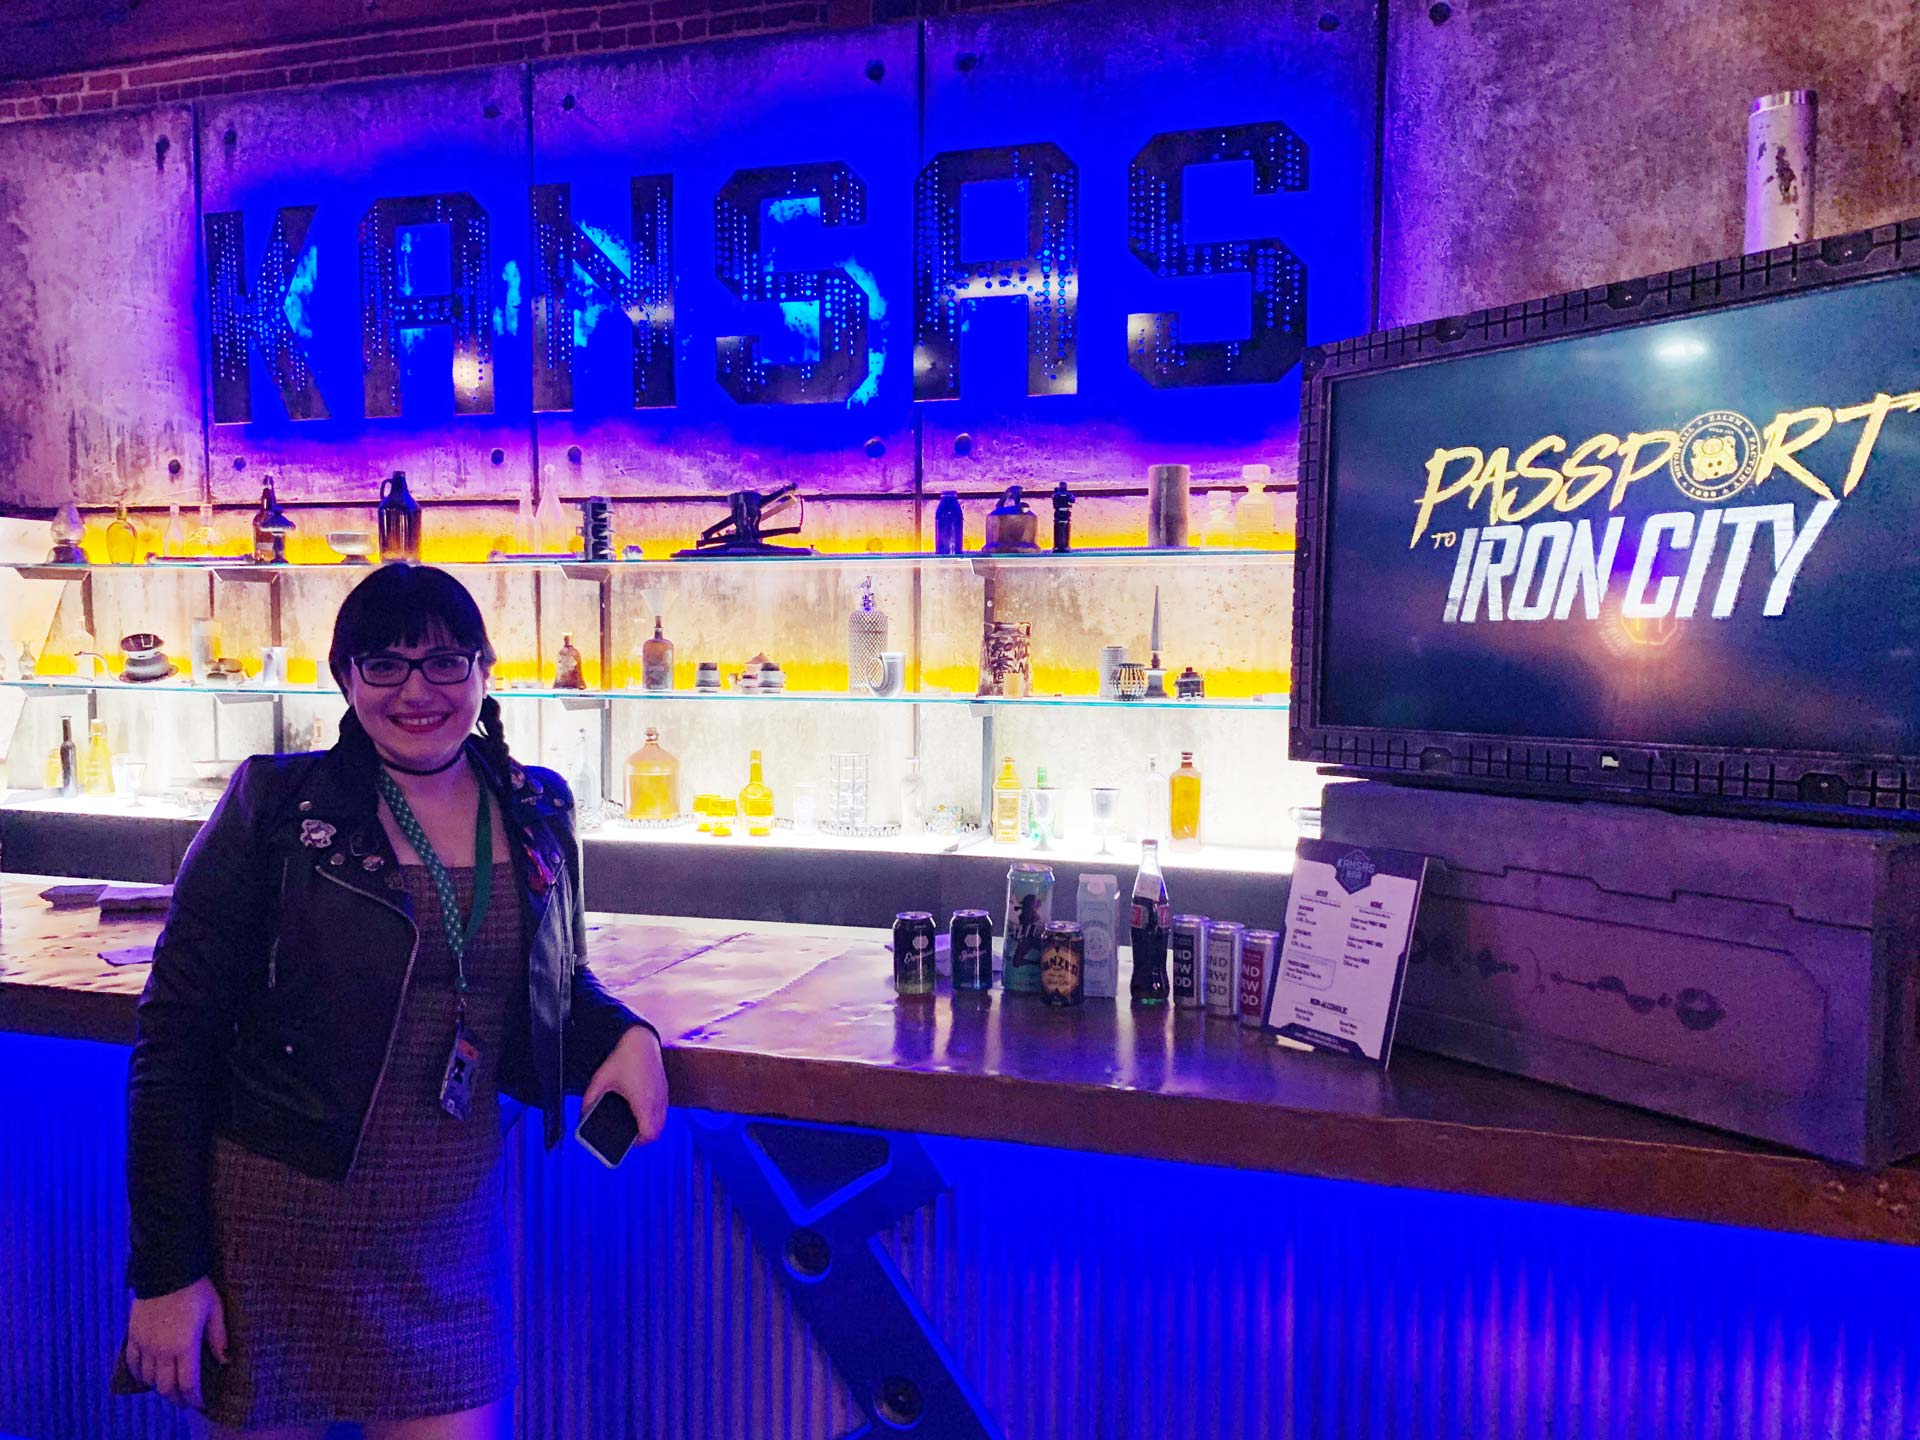 LATIN HORROR's Jennifer E. Ortega at Iron City's KANSAS Bar. Photo: Rick Hong.